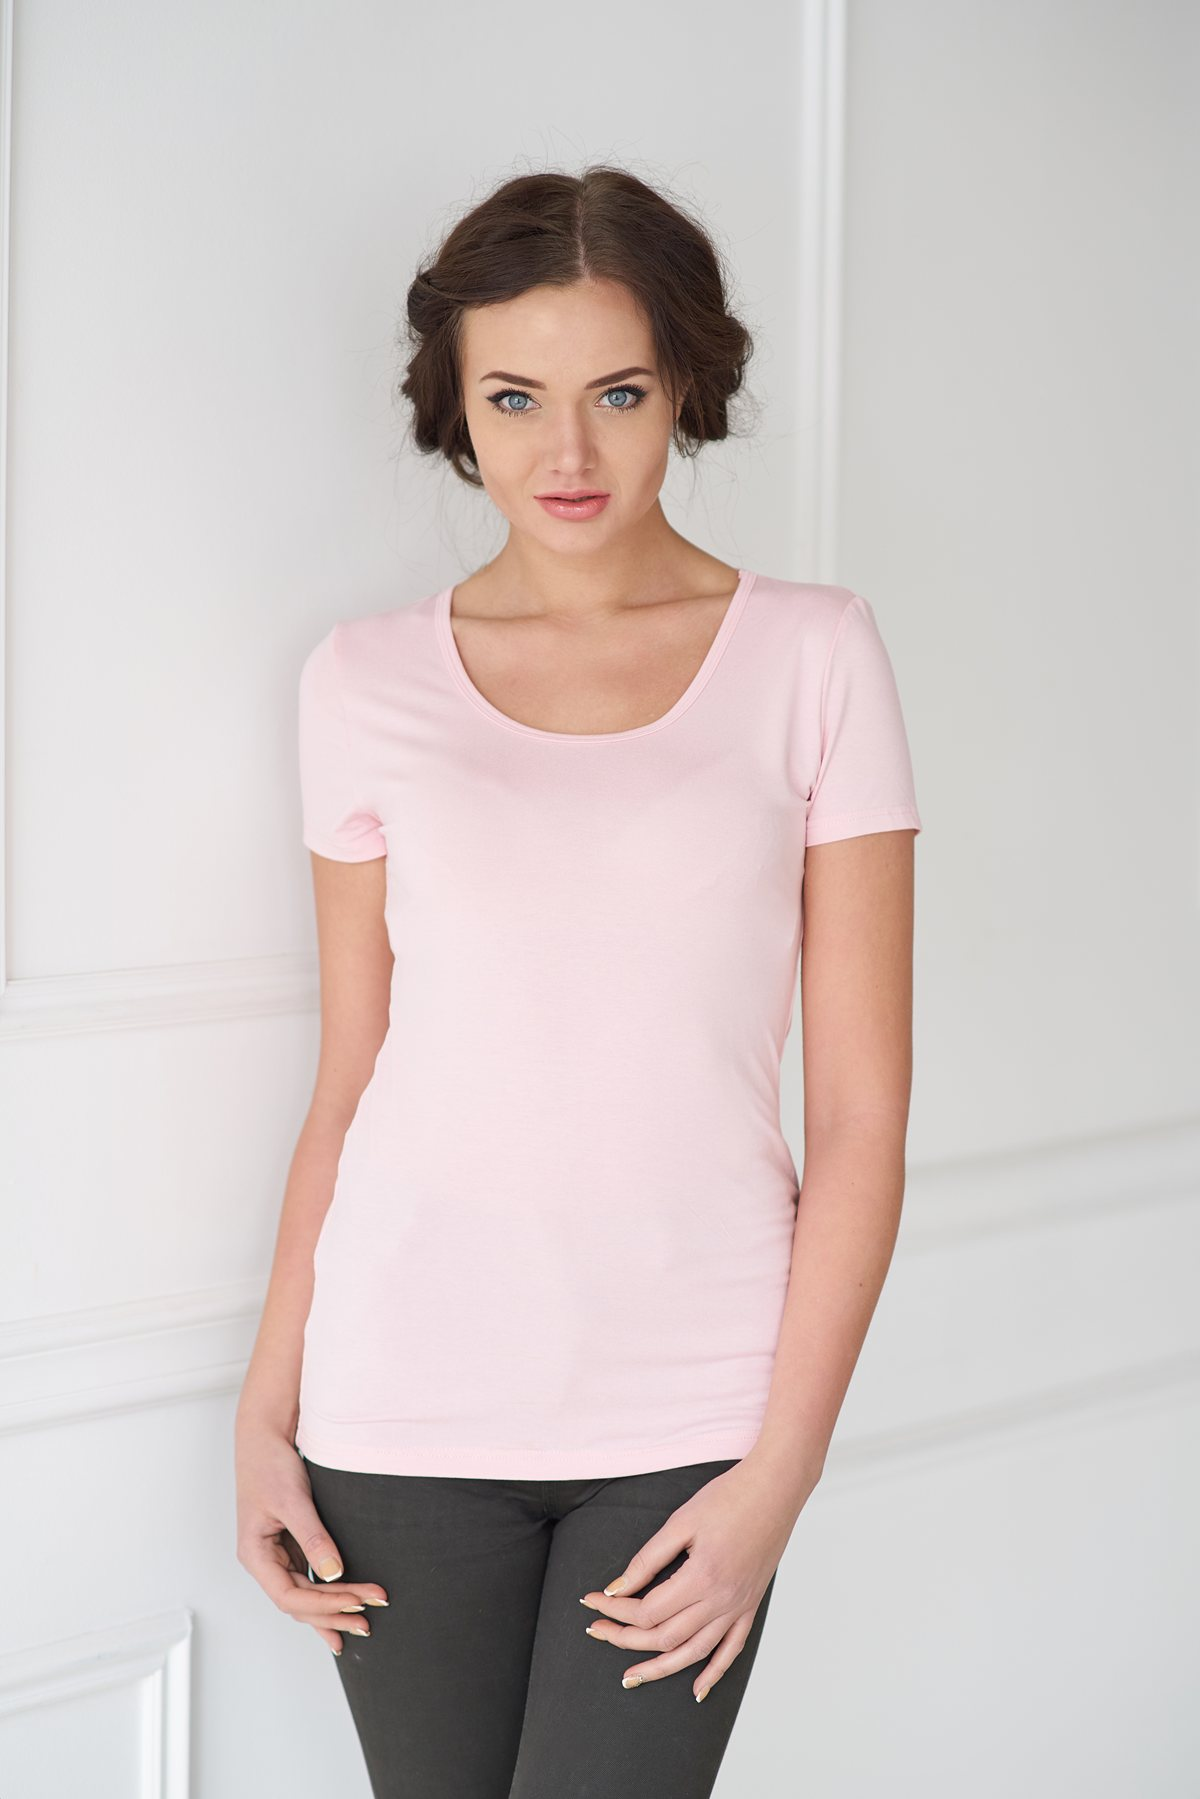 Жен. футболка арт. 19-0033 Розовый р. 46Майки и футболки<br>Факт. ОГ: 84 см <br>Факт. ОТ: 80 см <br>Факт. ОБ: 92 см <br>Длина по спинке: 66 см<br><br>Тип: Жен. футболка<br>Размер: 46<br>Материал: Вискоза